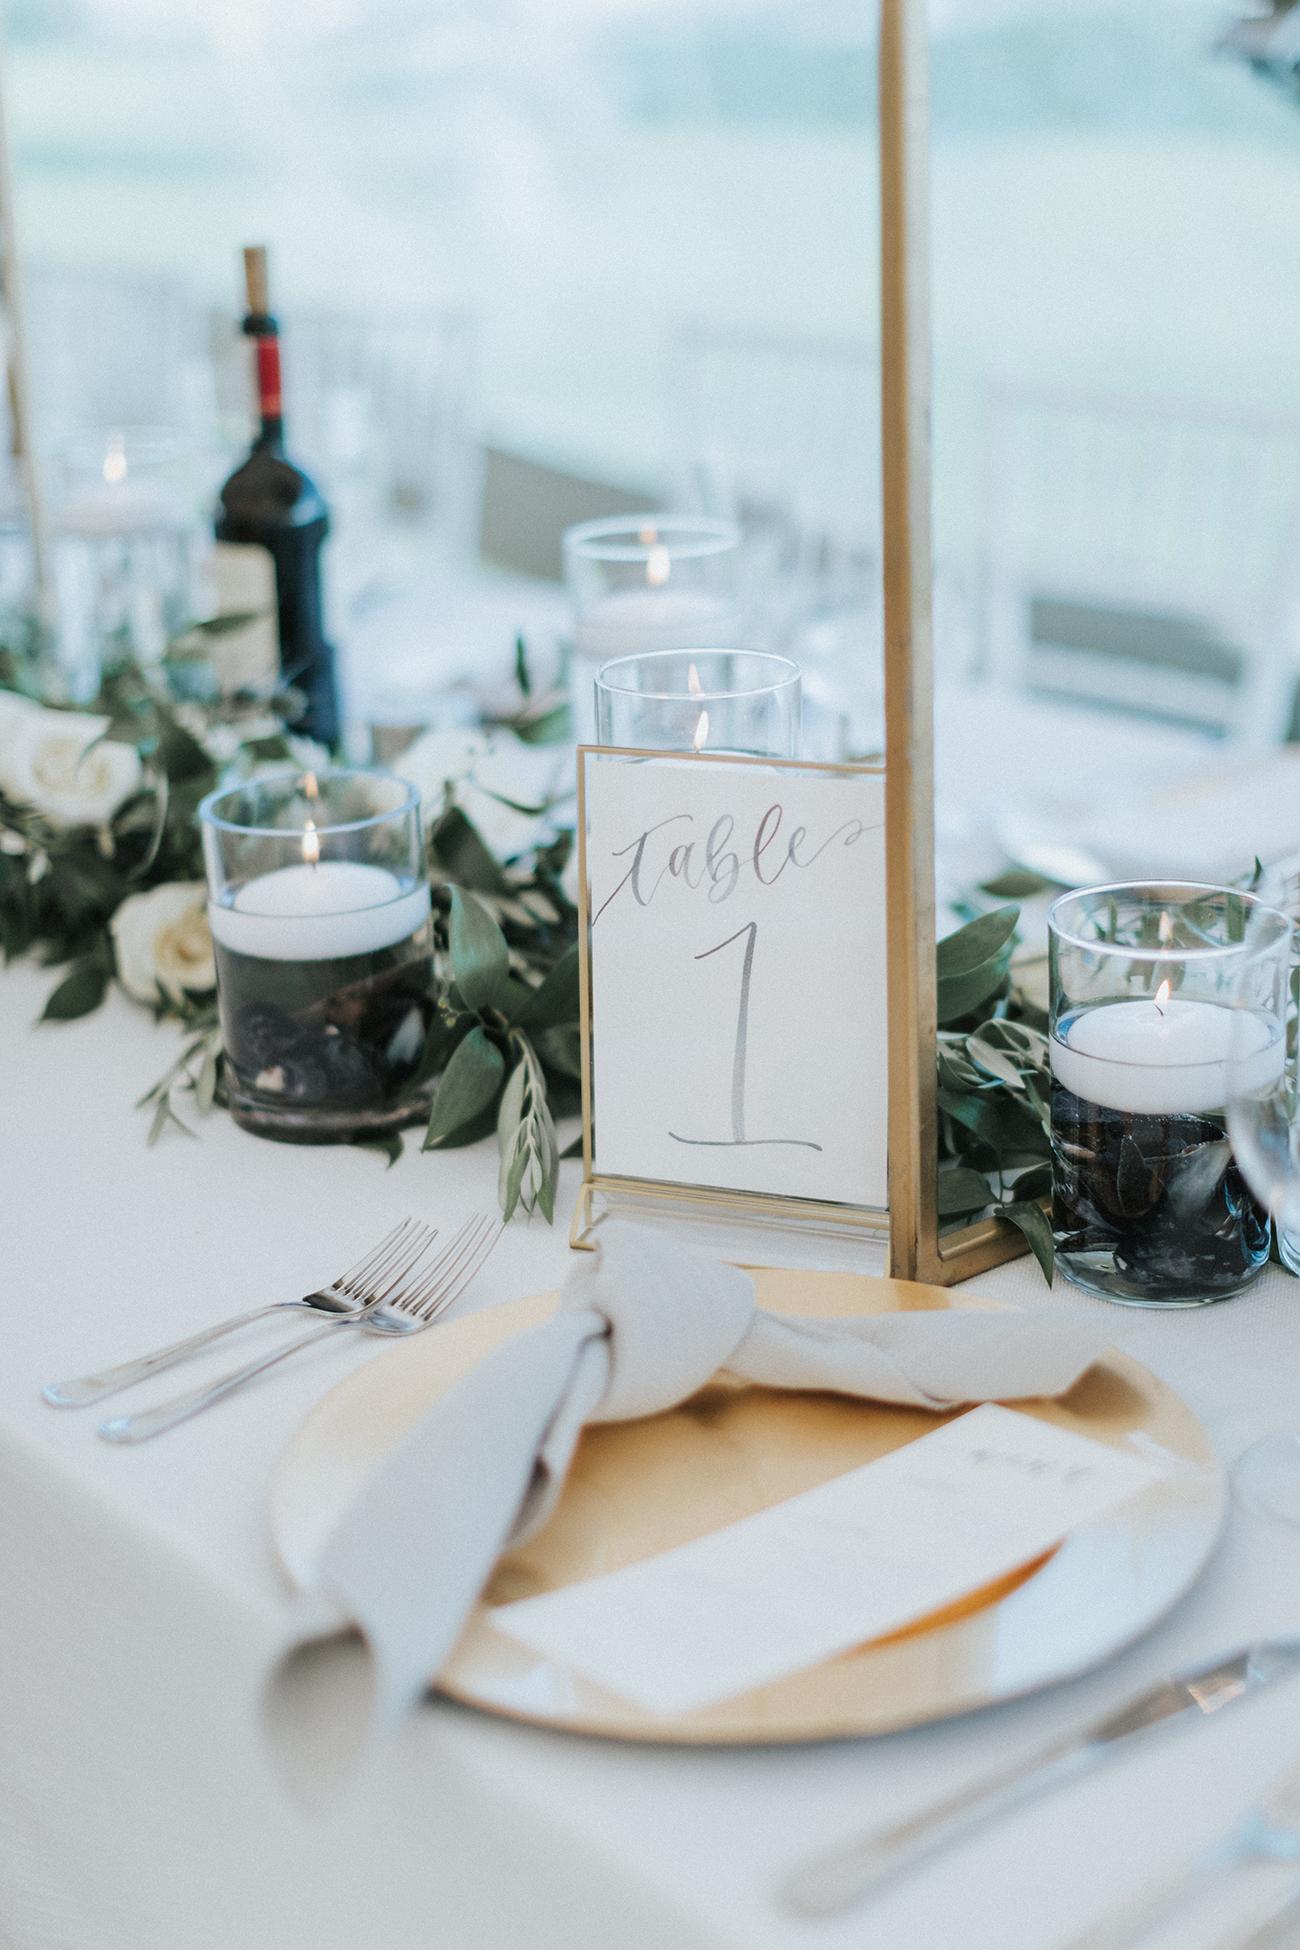 Sam Allen Creates – Watercolor Wedding Reception Menu and Table Numbers